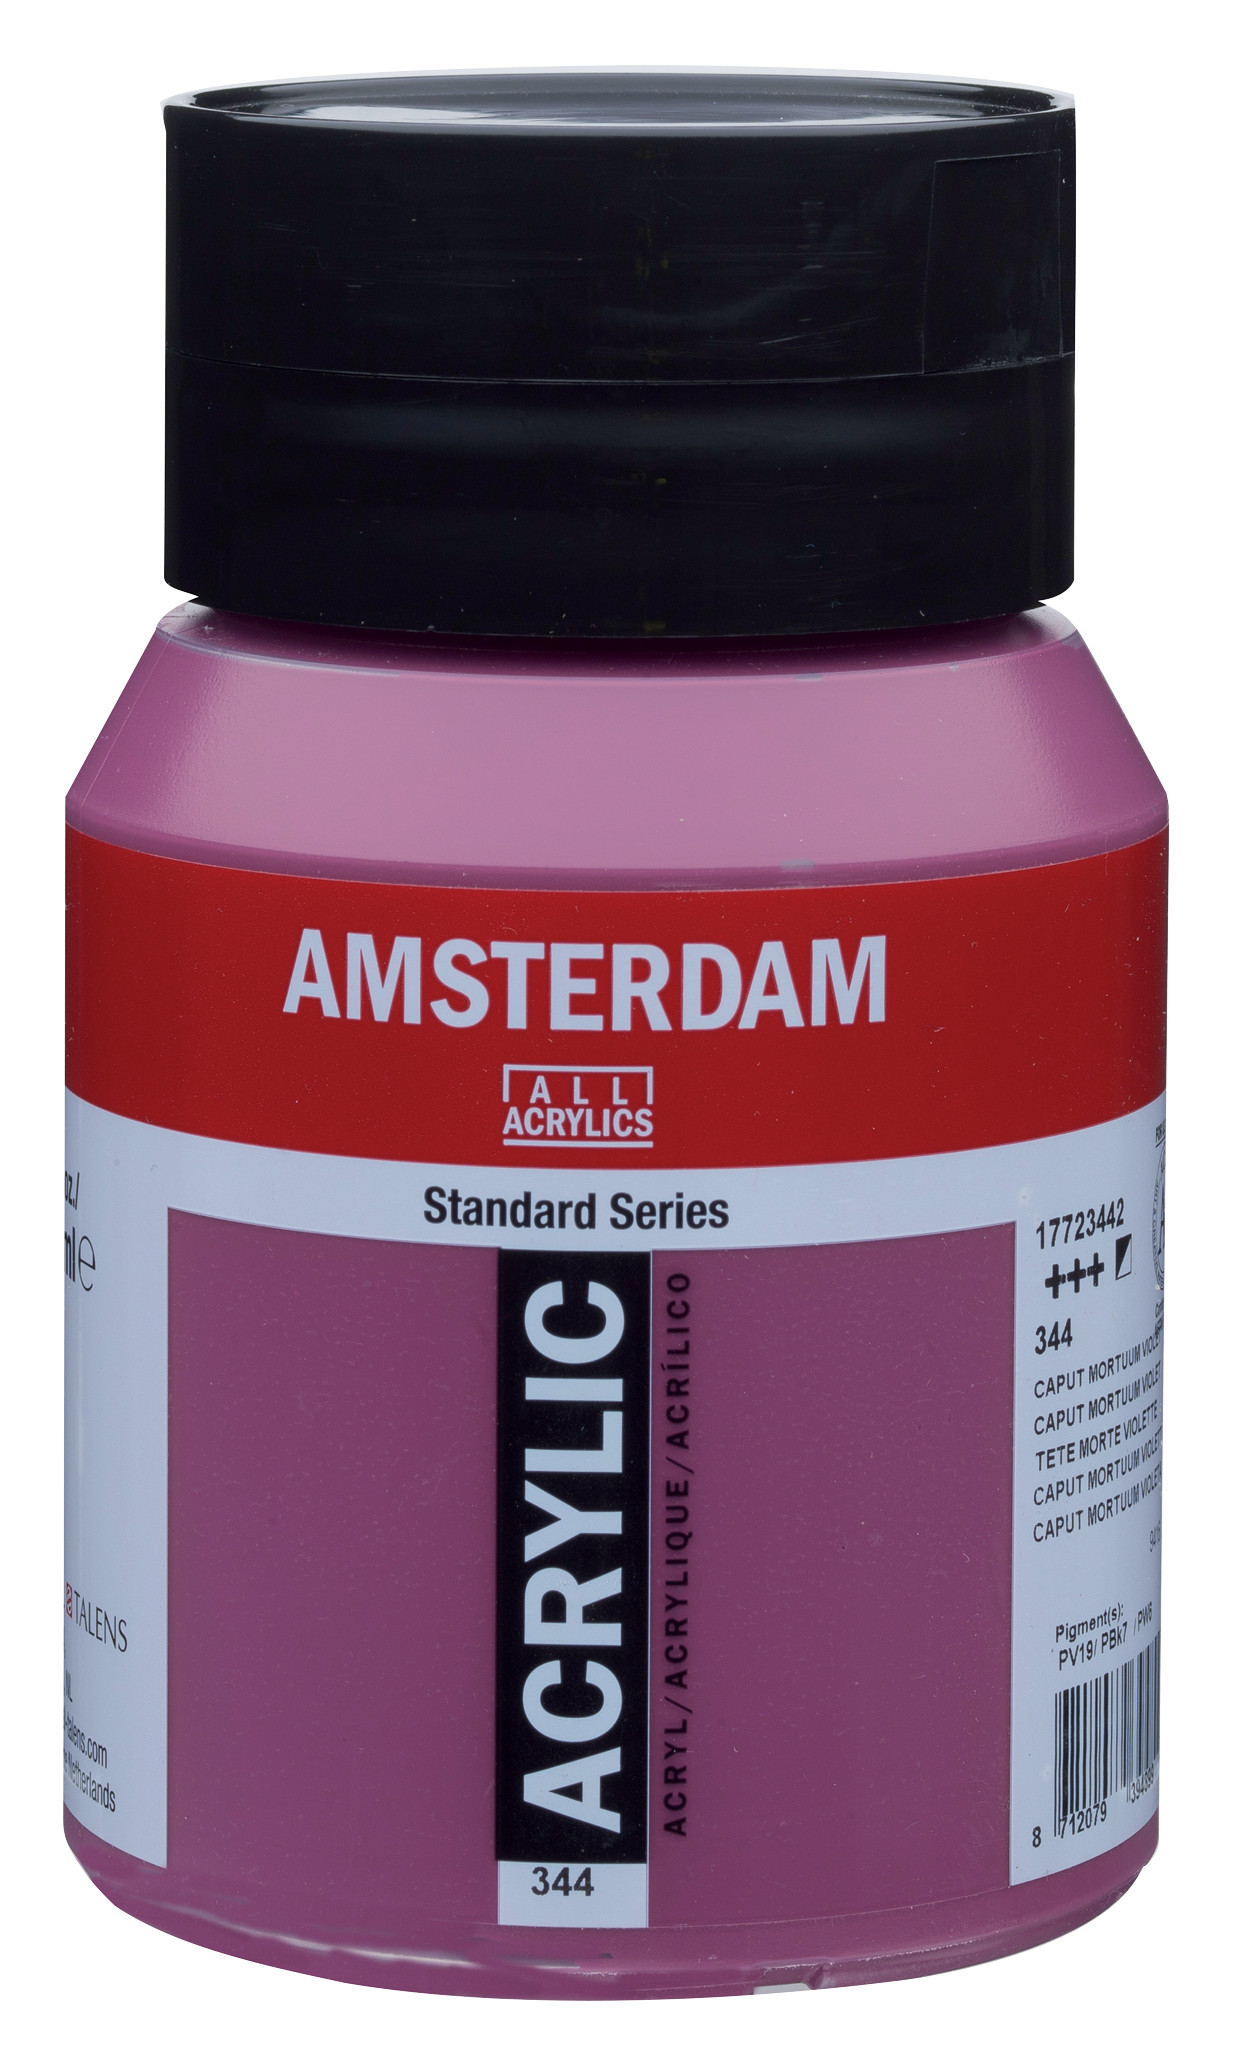 Amsterdam Standard Series Acrylic Jar 500 ml Caput mortuum violet 344